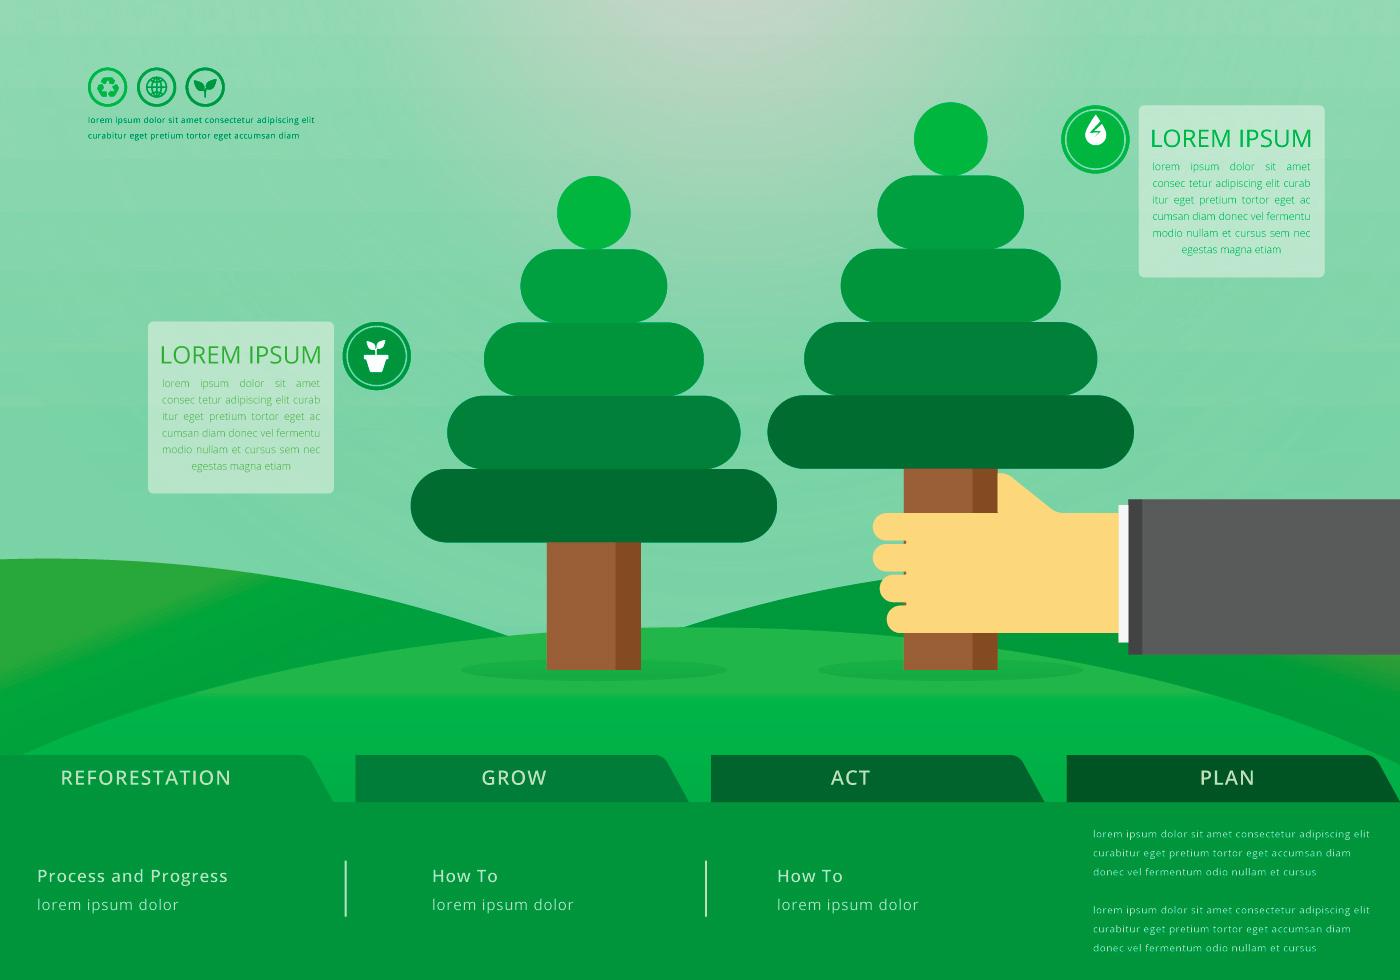 hight resolution of reforestation free vector art 18 free downloads diagram of reforestation 21